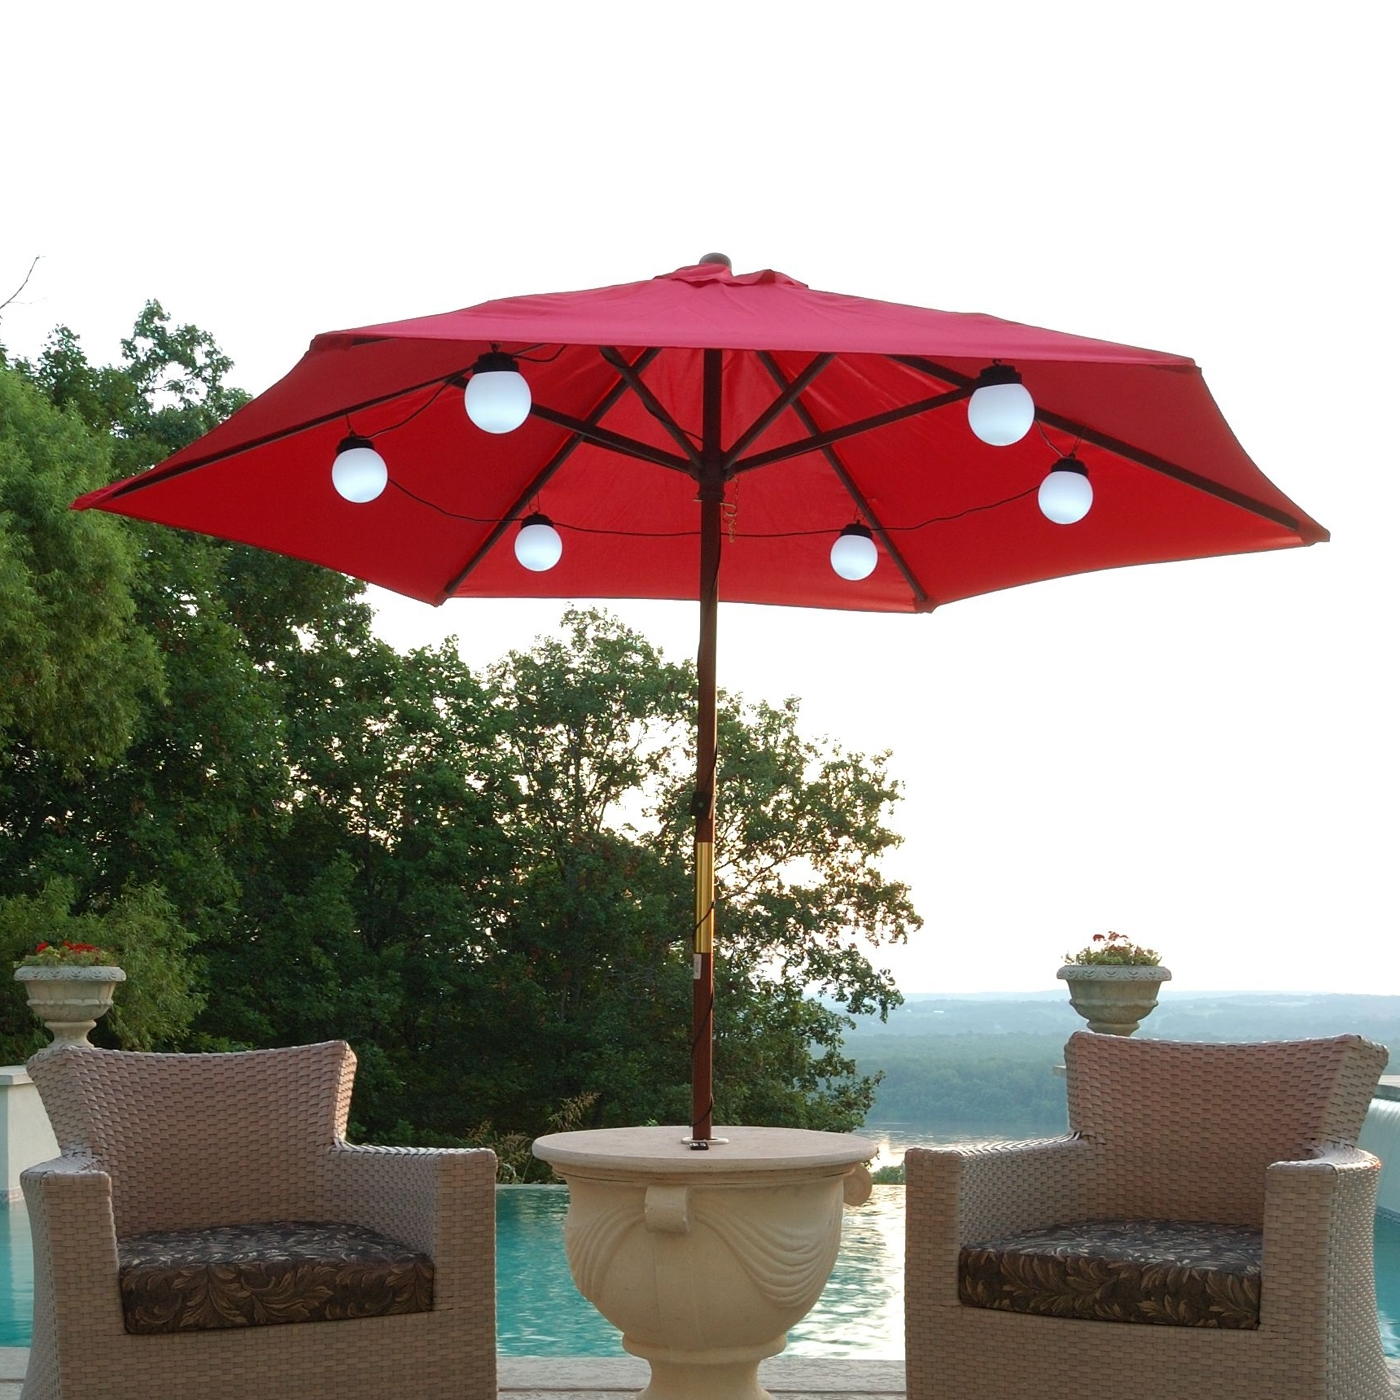 Patio Umbrella Lights Style — Wilson Home Ideas : Beautiful Patio Within 2019 Patio Umbrella Lights (View 16 of 20)